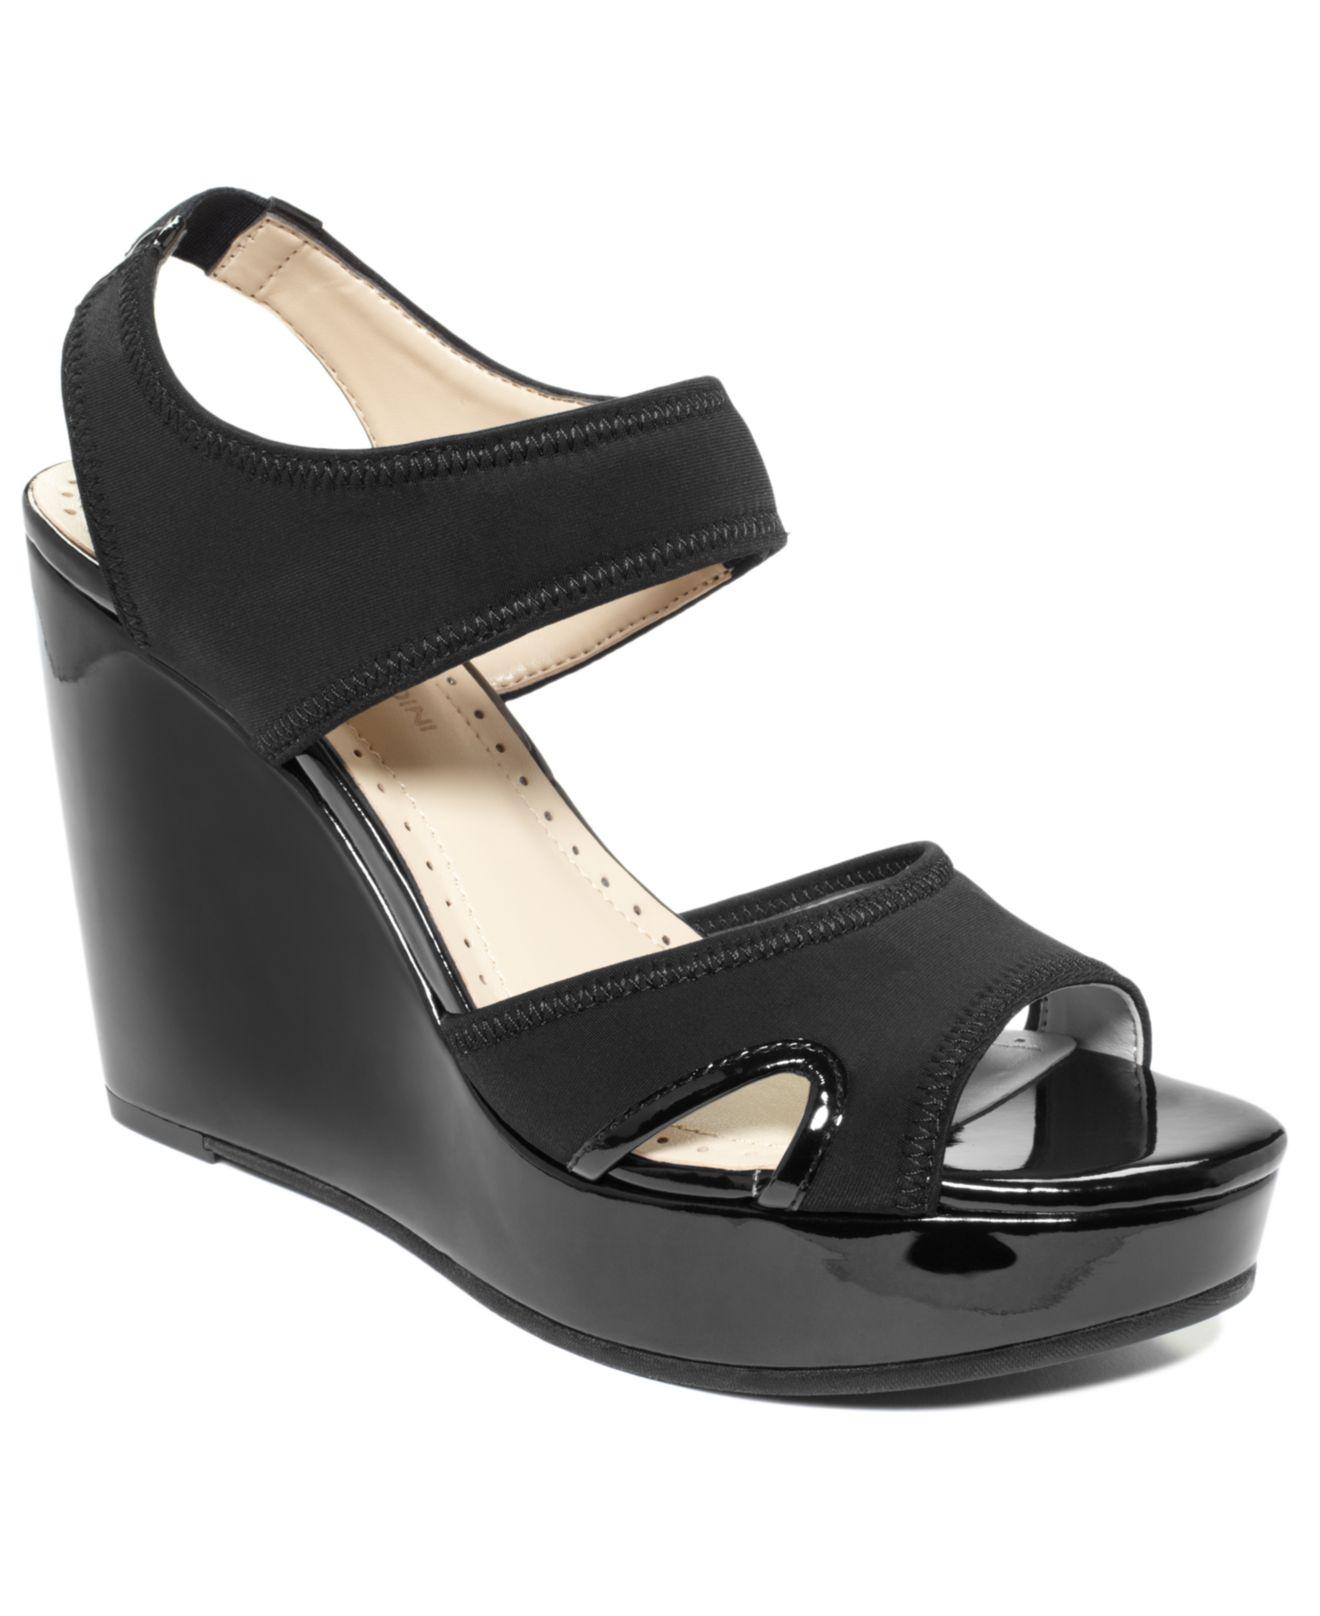 1b147114e3b Lyst - Adrienne Vittadini Clover Platform Wedge Sandals in Black